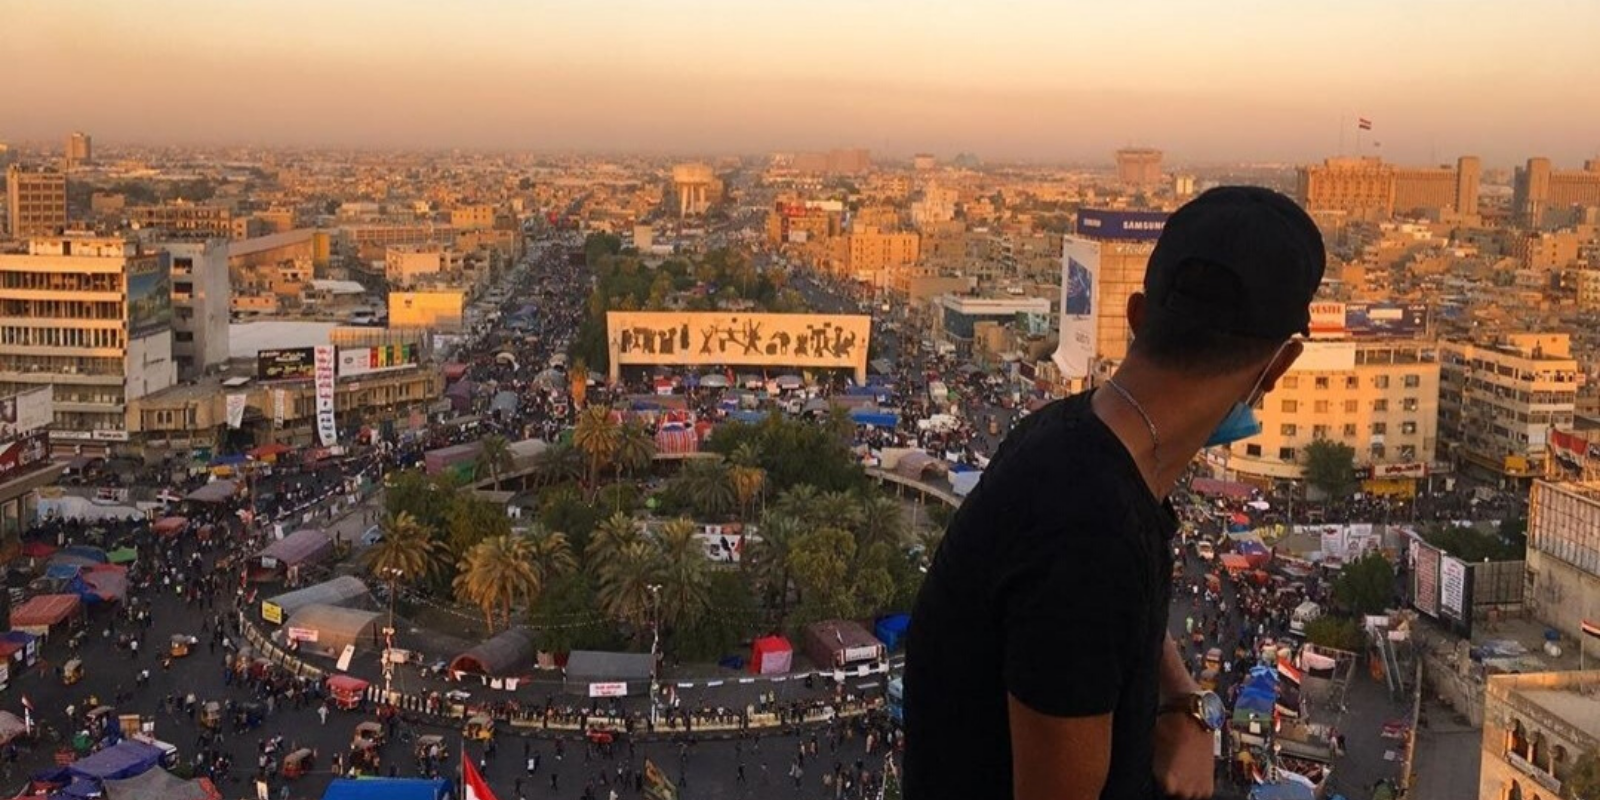 näkyvä Bagdadissa